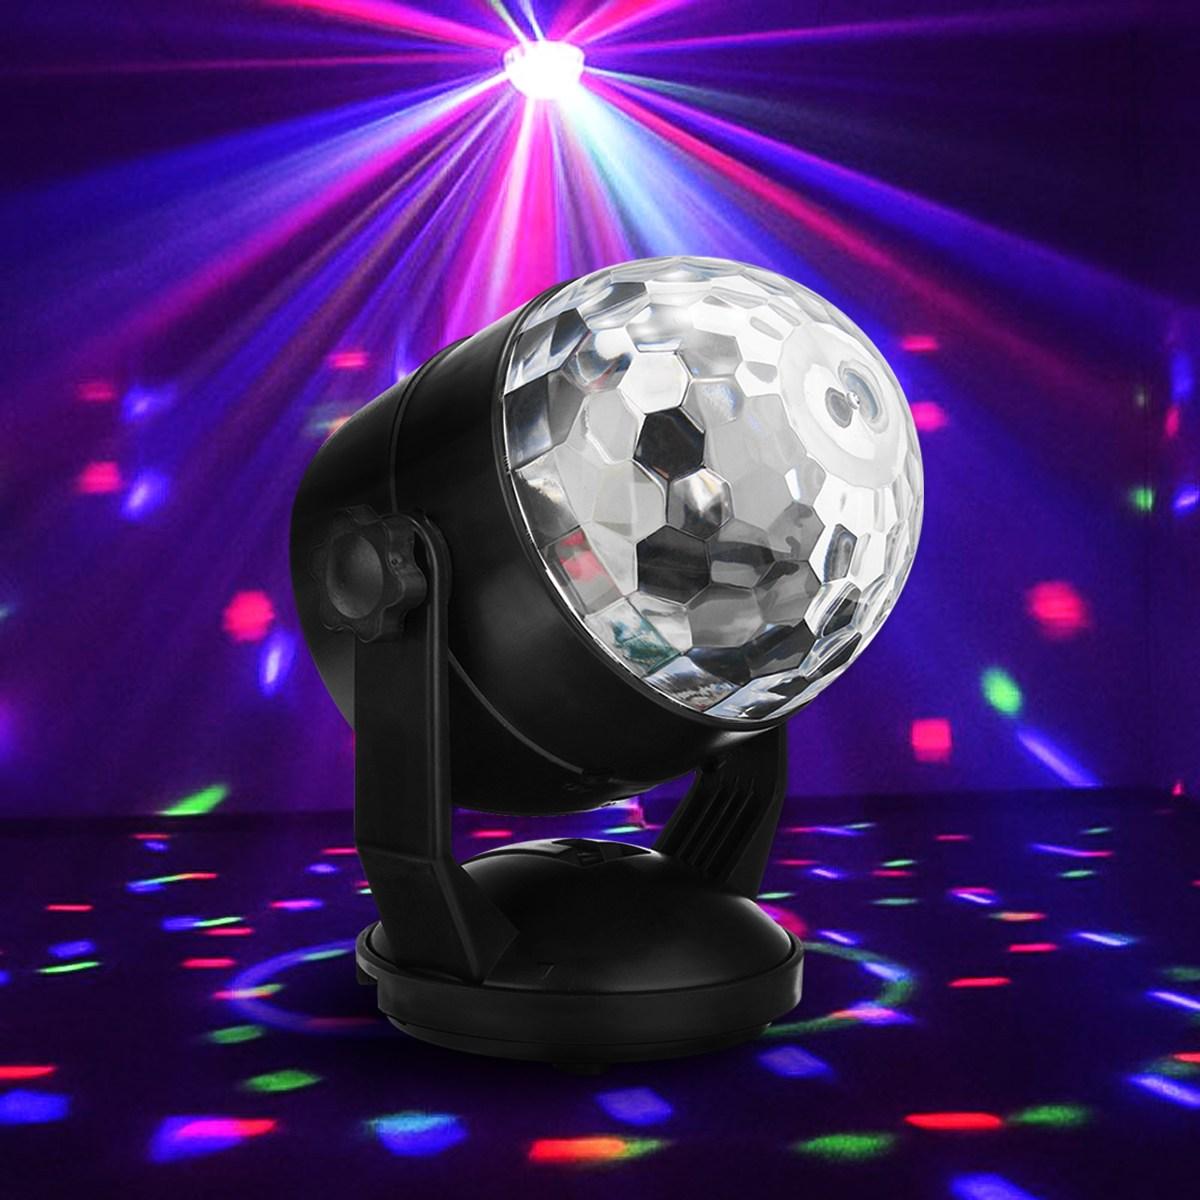 Magic Ball Auto LED RGB Stage Light Voice Sound Control Night Lamp USB Battery Power Disco Crystal DJ Club Bar Party Decor auto rotating rgb led stage light voice control holiday party disco club bar ktv dj led crystal magic ball lighting effect lamp